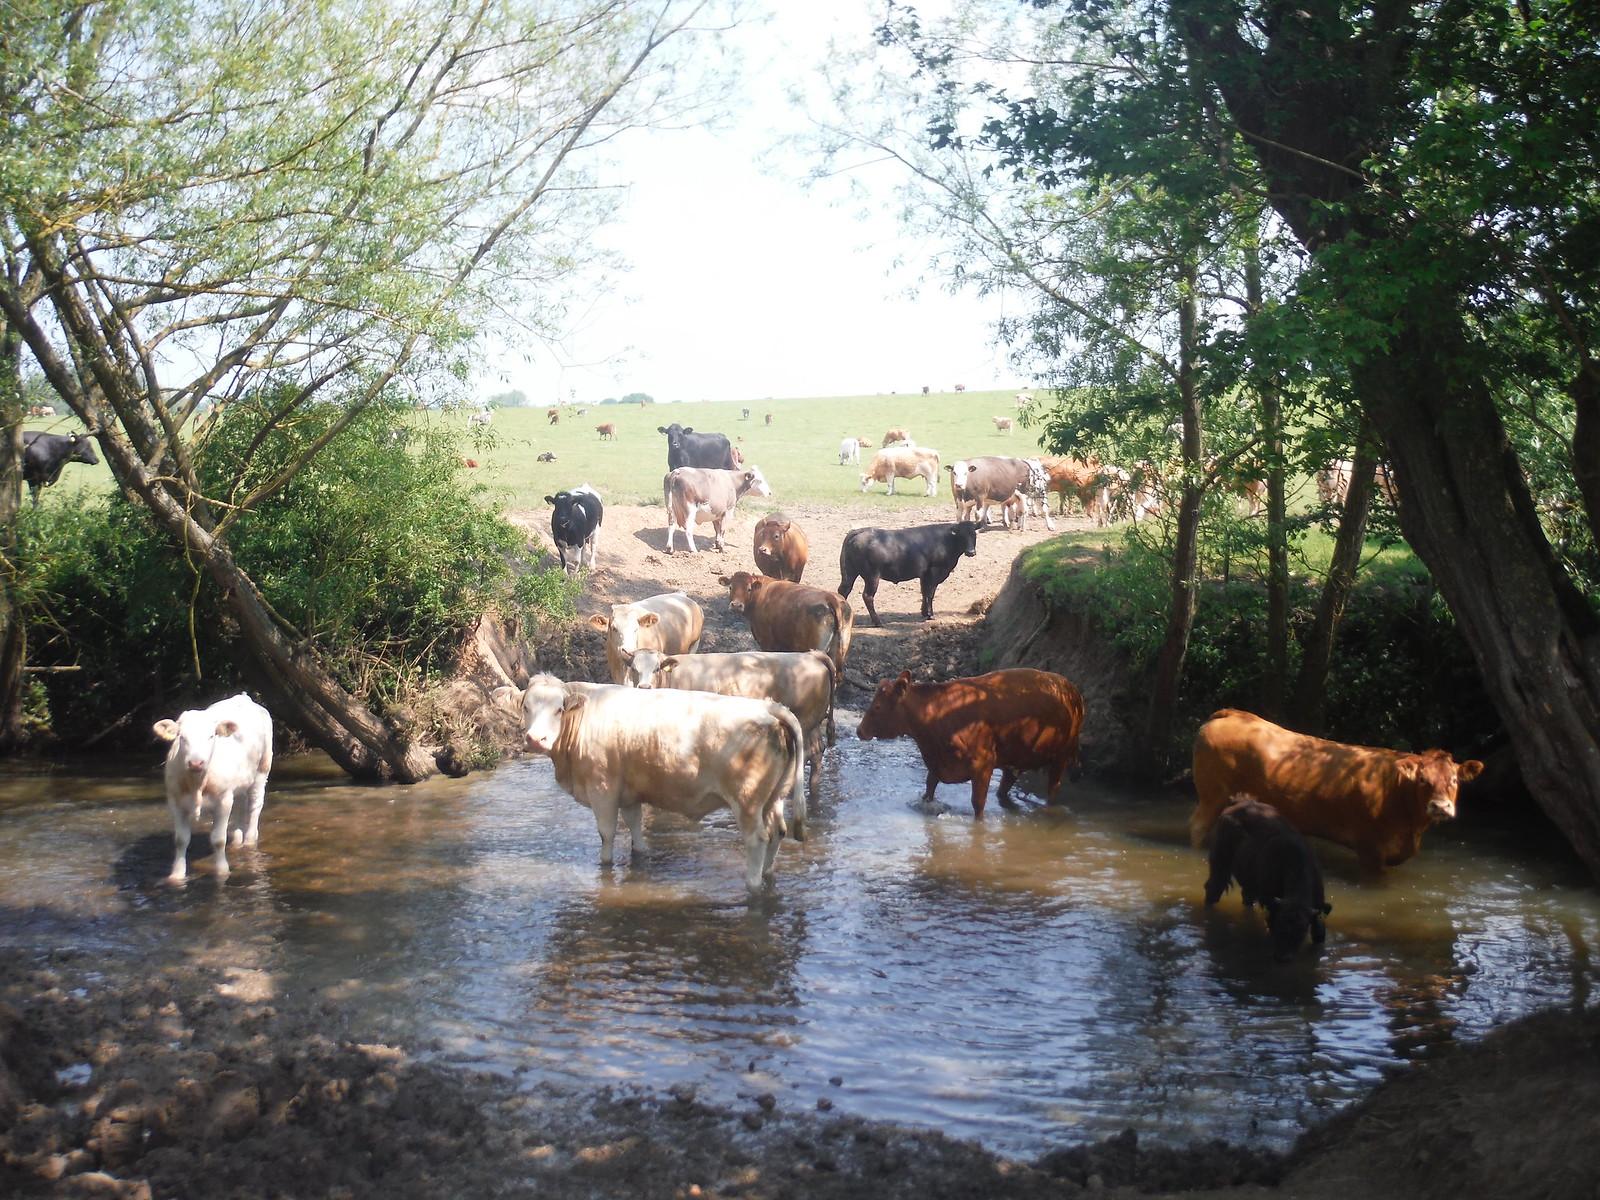 Cattle in The River Wid (Fristling Hall) SWC Walk 158 - Ingatestone to Battlesbridge or Wickford